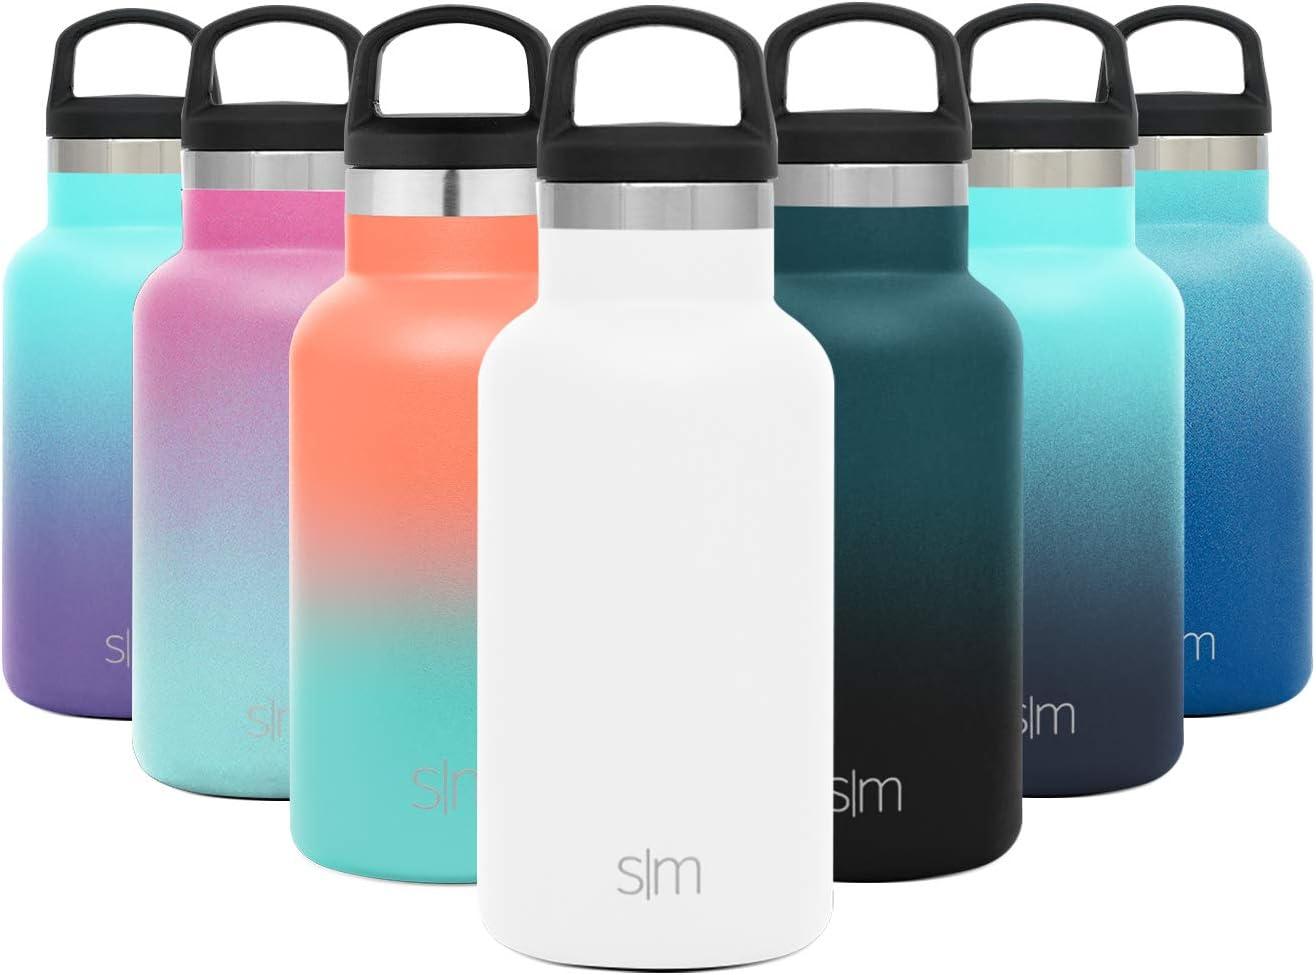 Simple Modern 350mL Ascent Termo Botella de Agua de Acero Inoxidable con Tapa de Asa, Botella termica con boca estrecha, aislada al vacío, doble pared, sin BPA para Deporte o Viaje, Prueba de Fugas